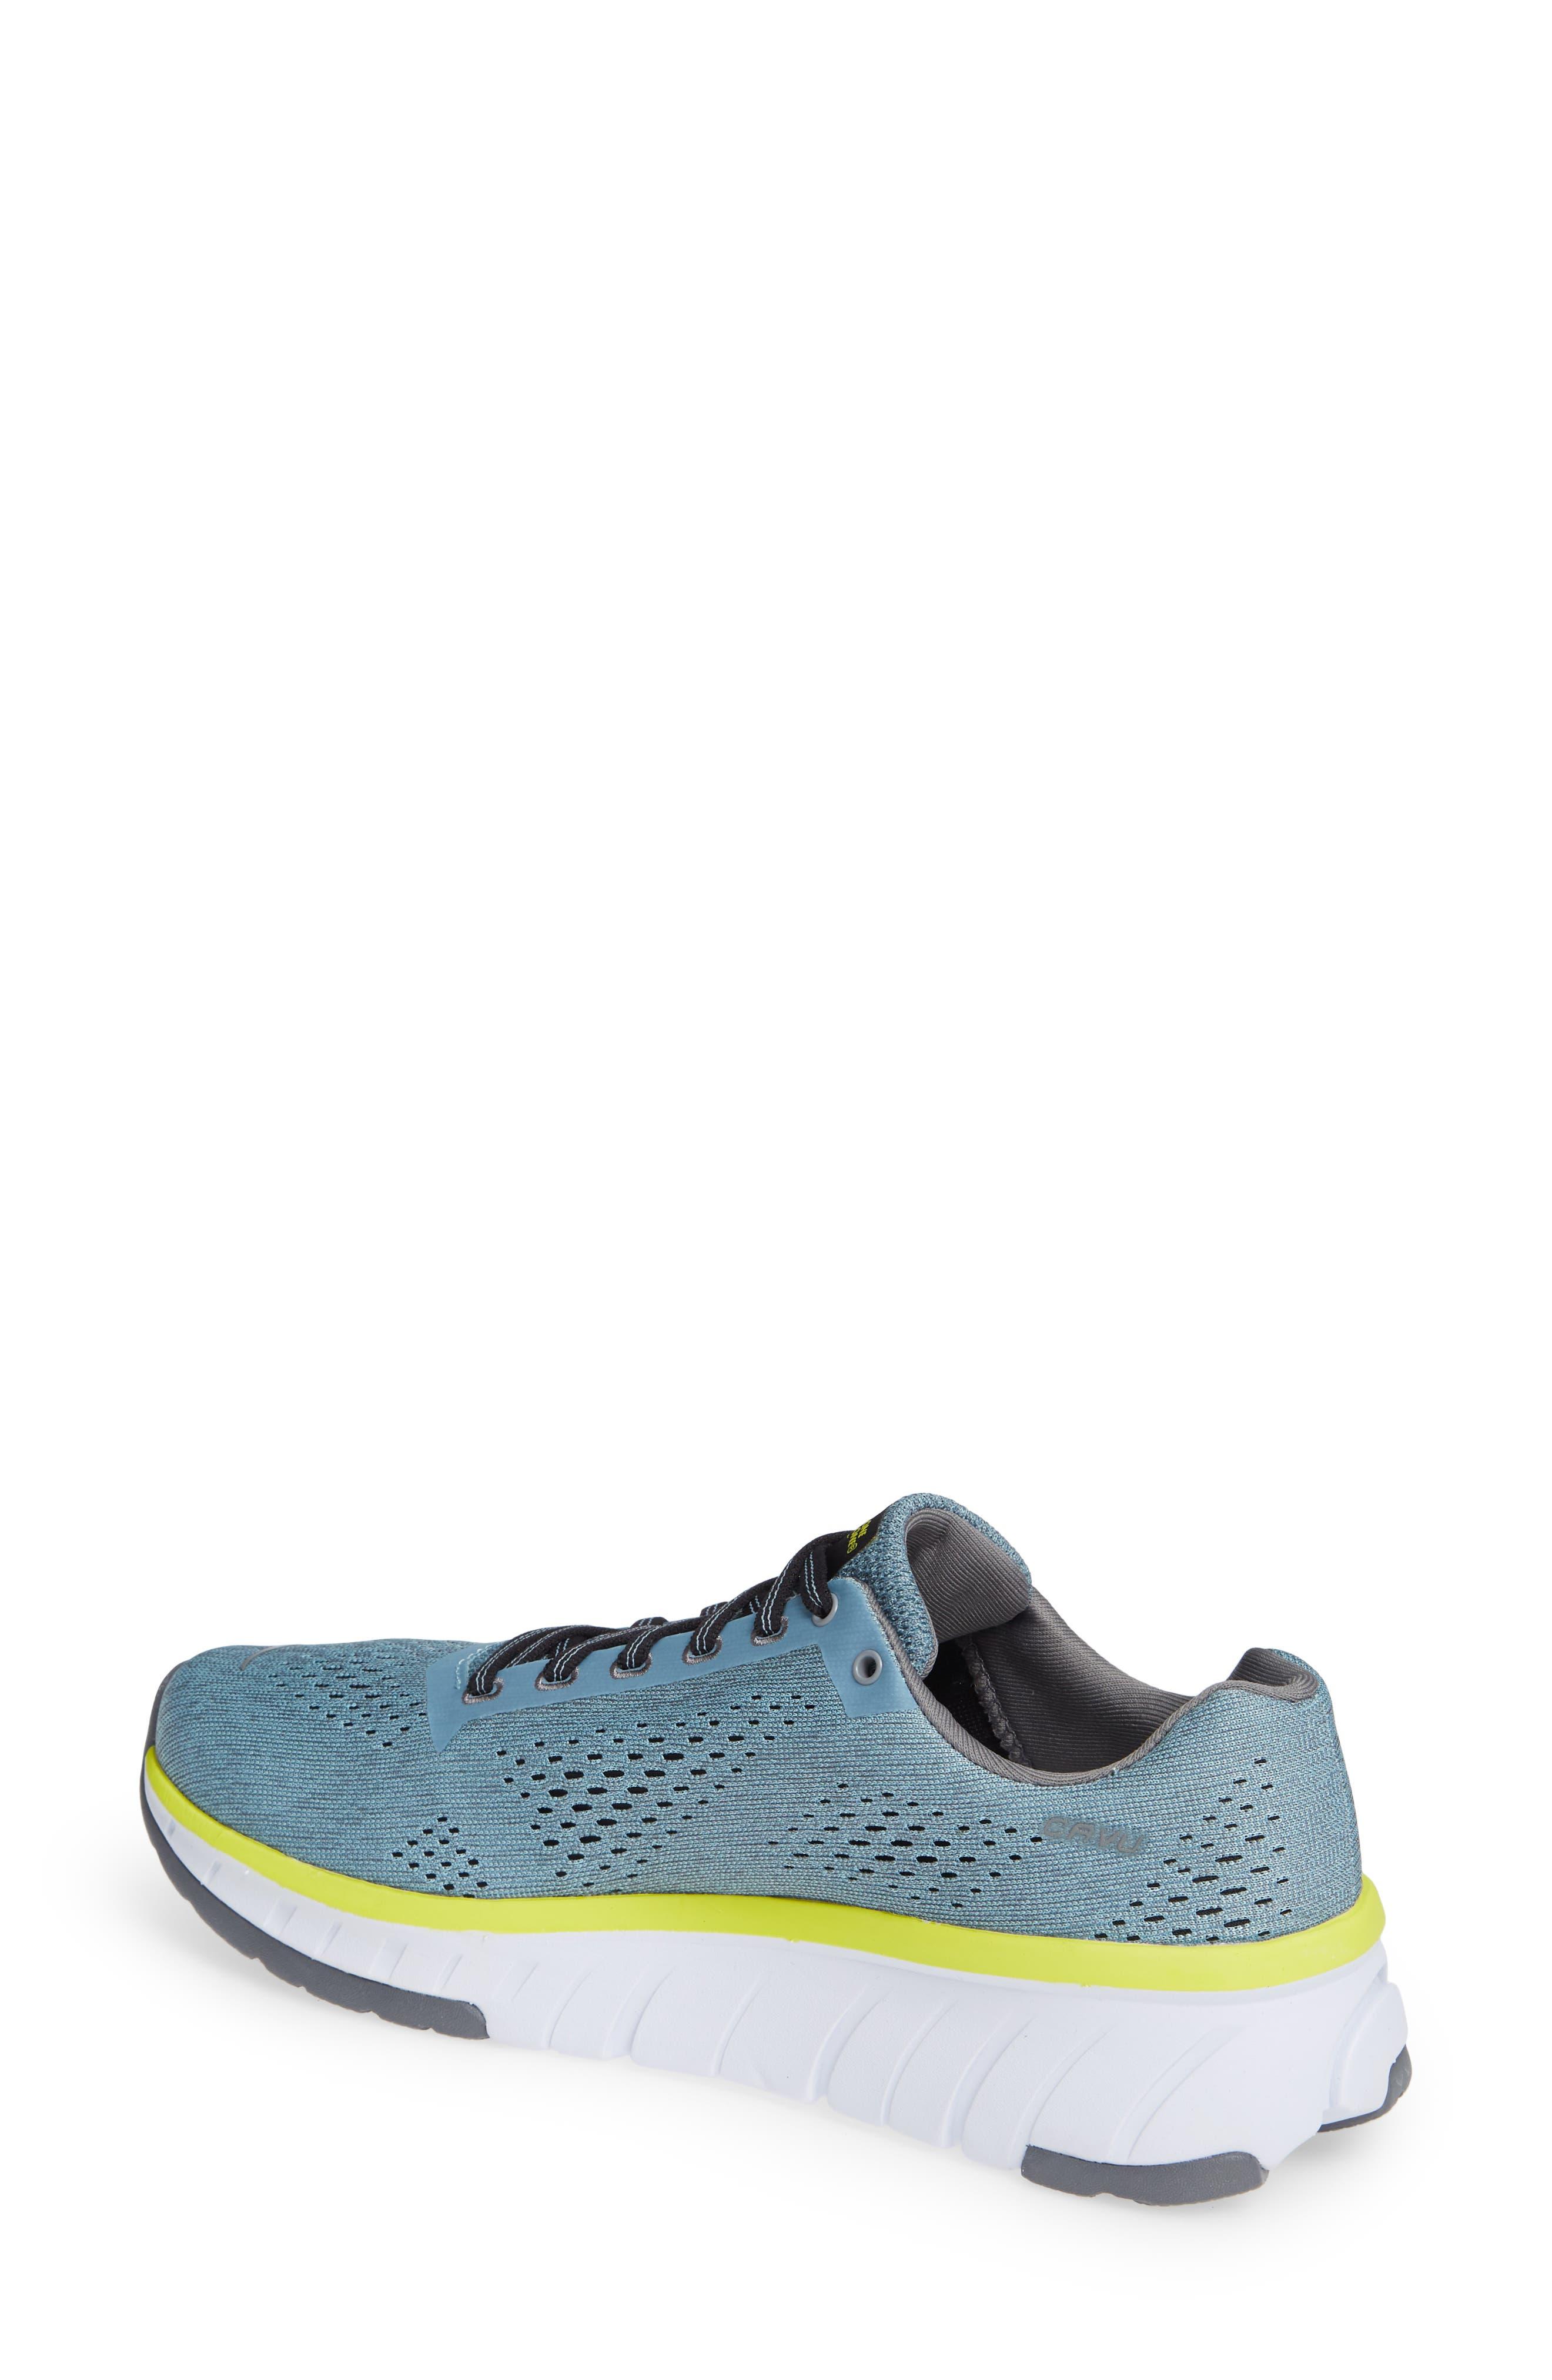 Cavu Running Shoe,                             Alternate thumbnail 2, color,                             SKY BLUE/ NEUTRAL GREY